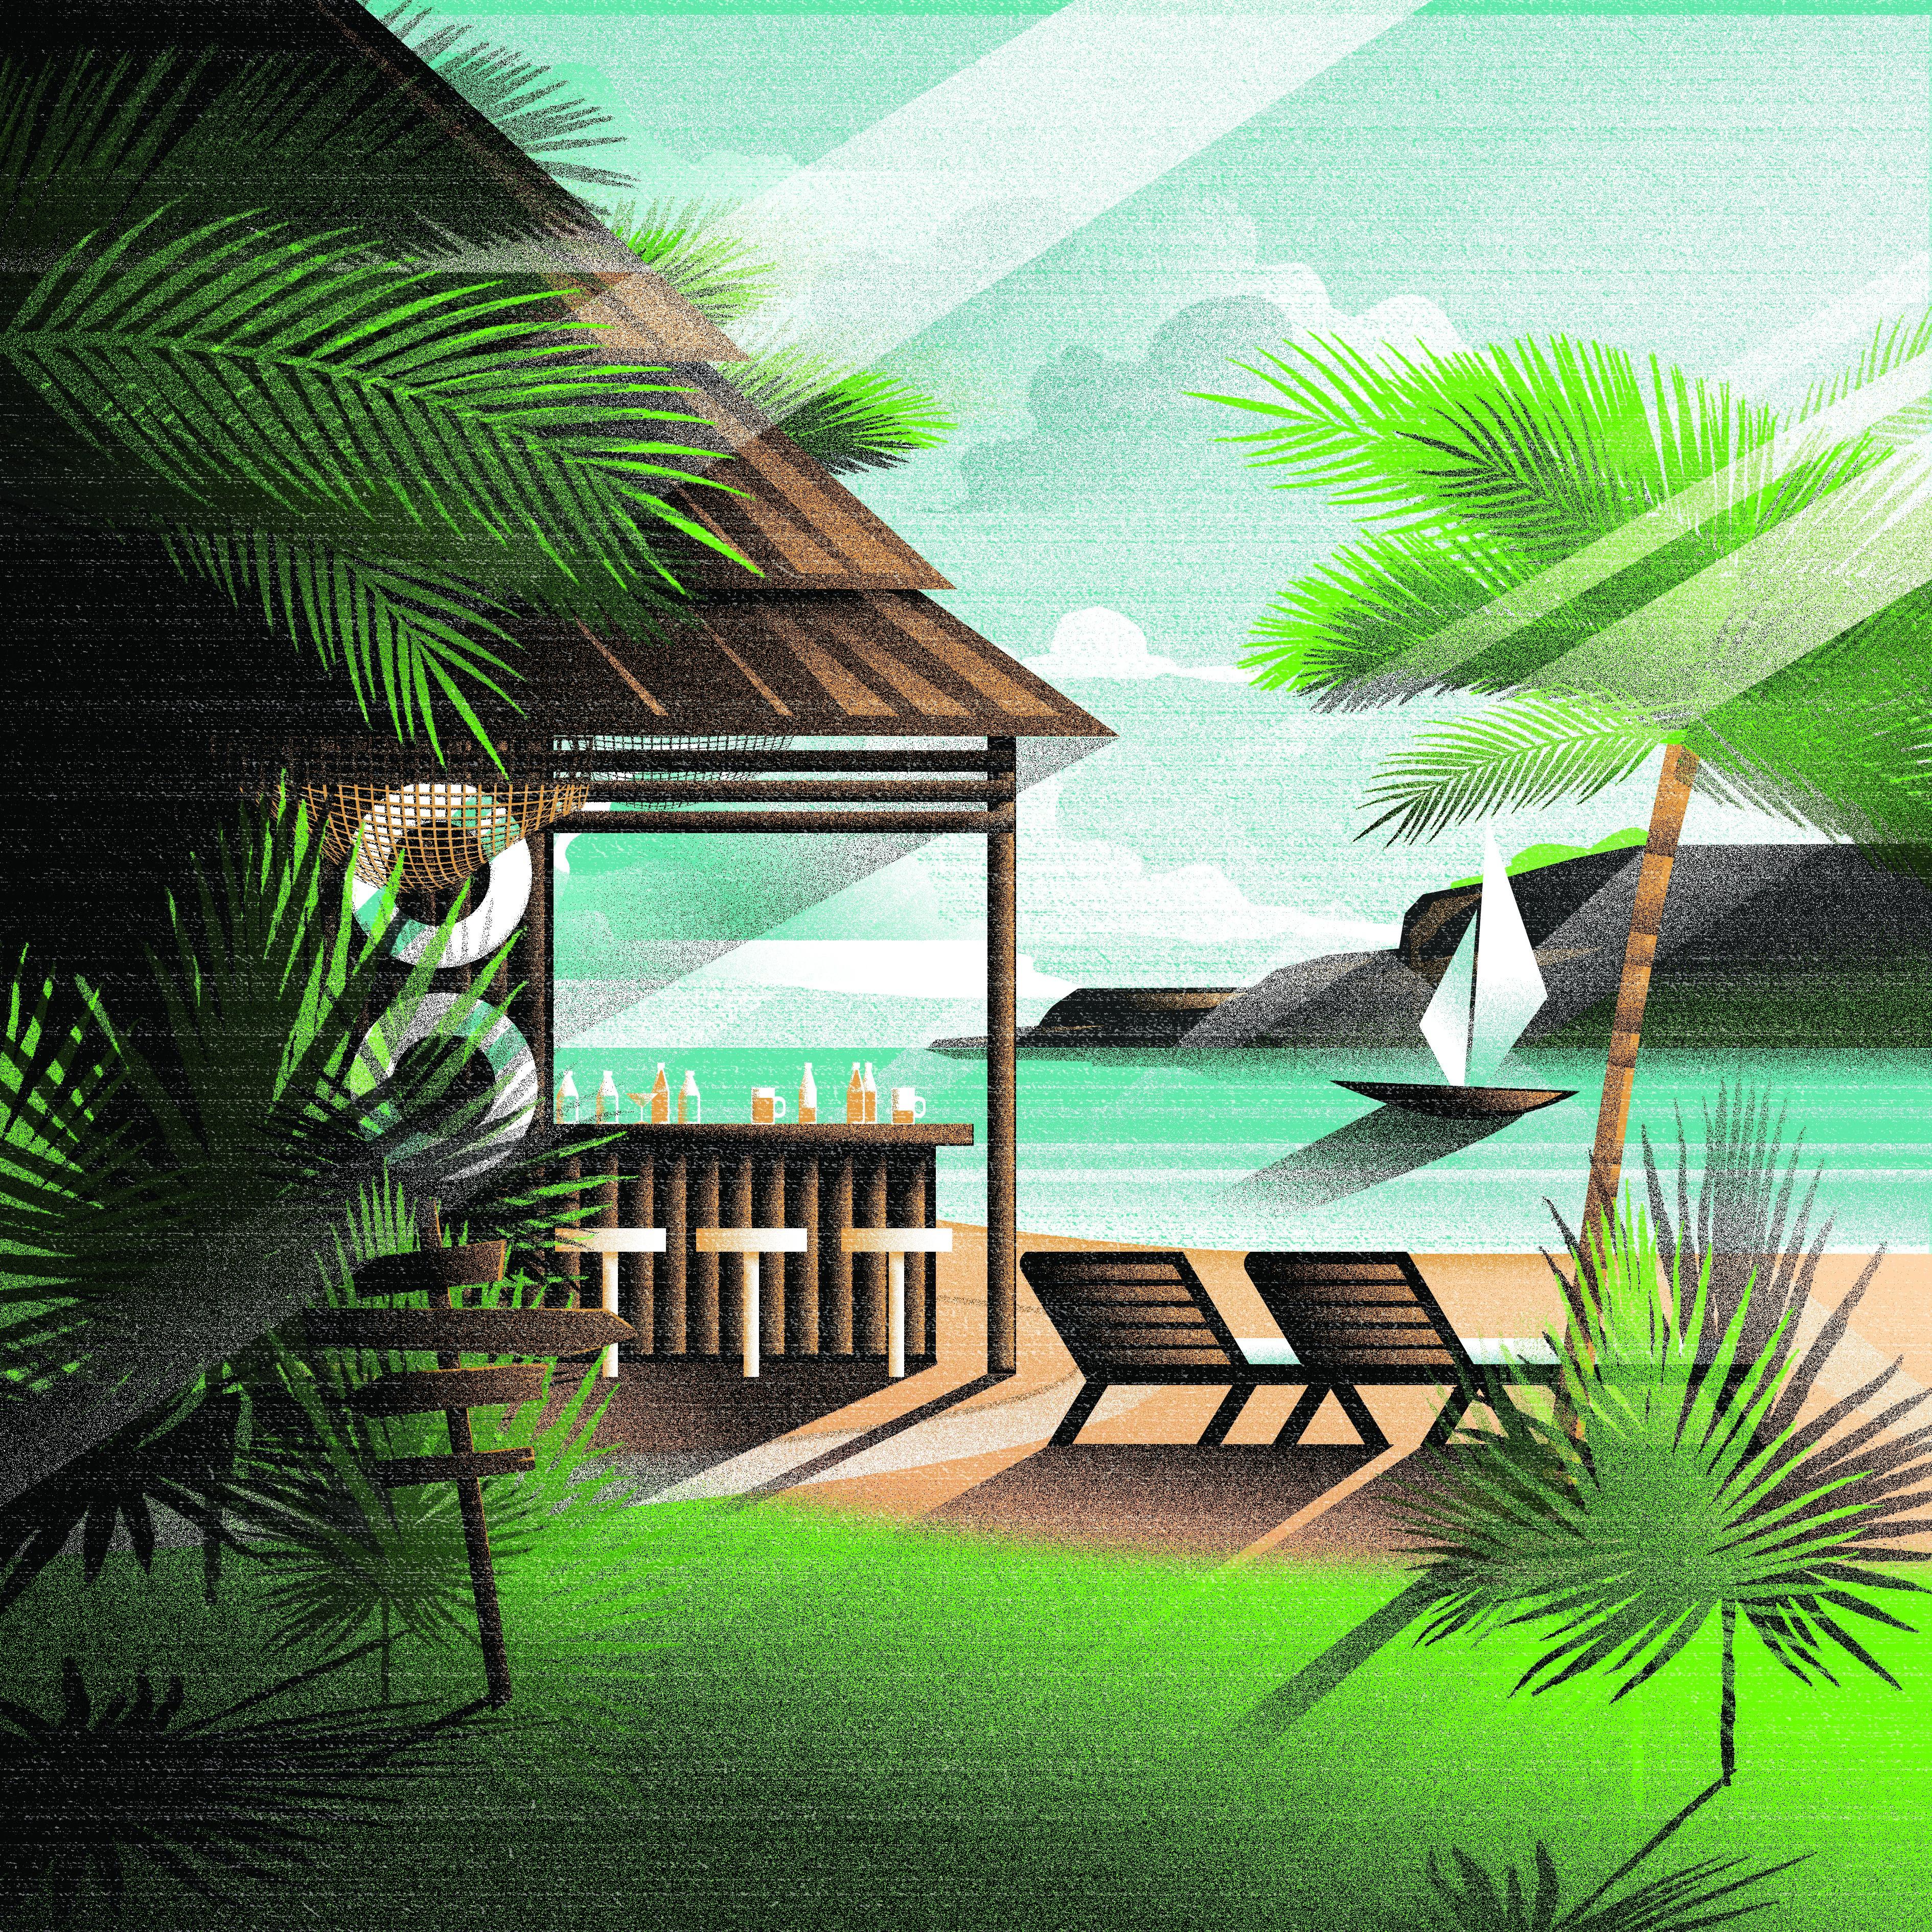 Beach Shack Illustration